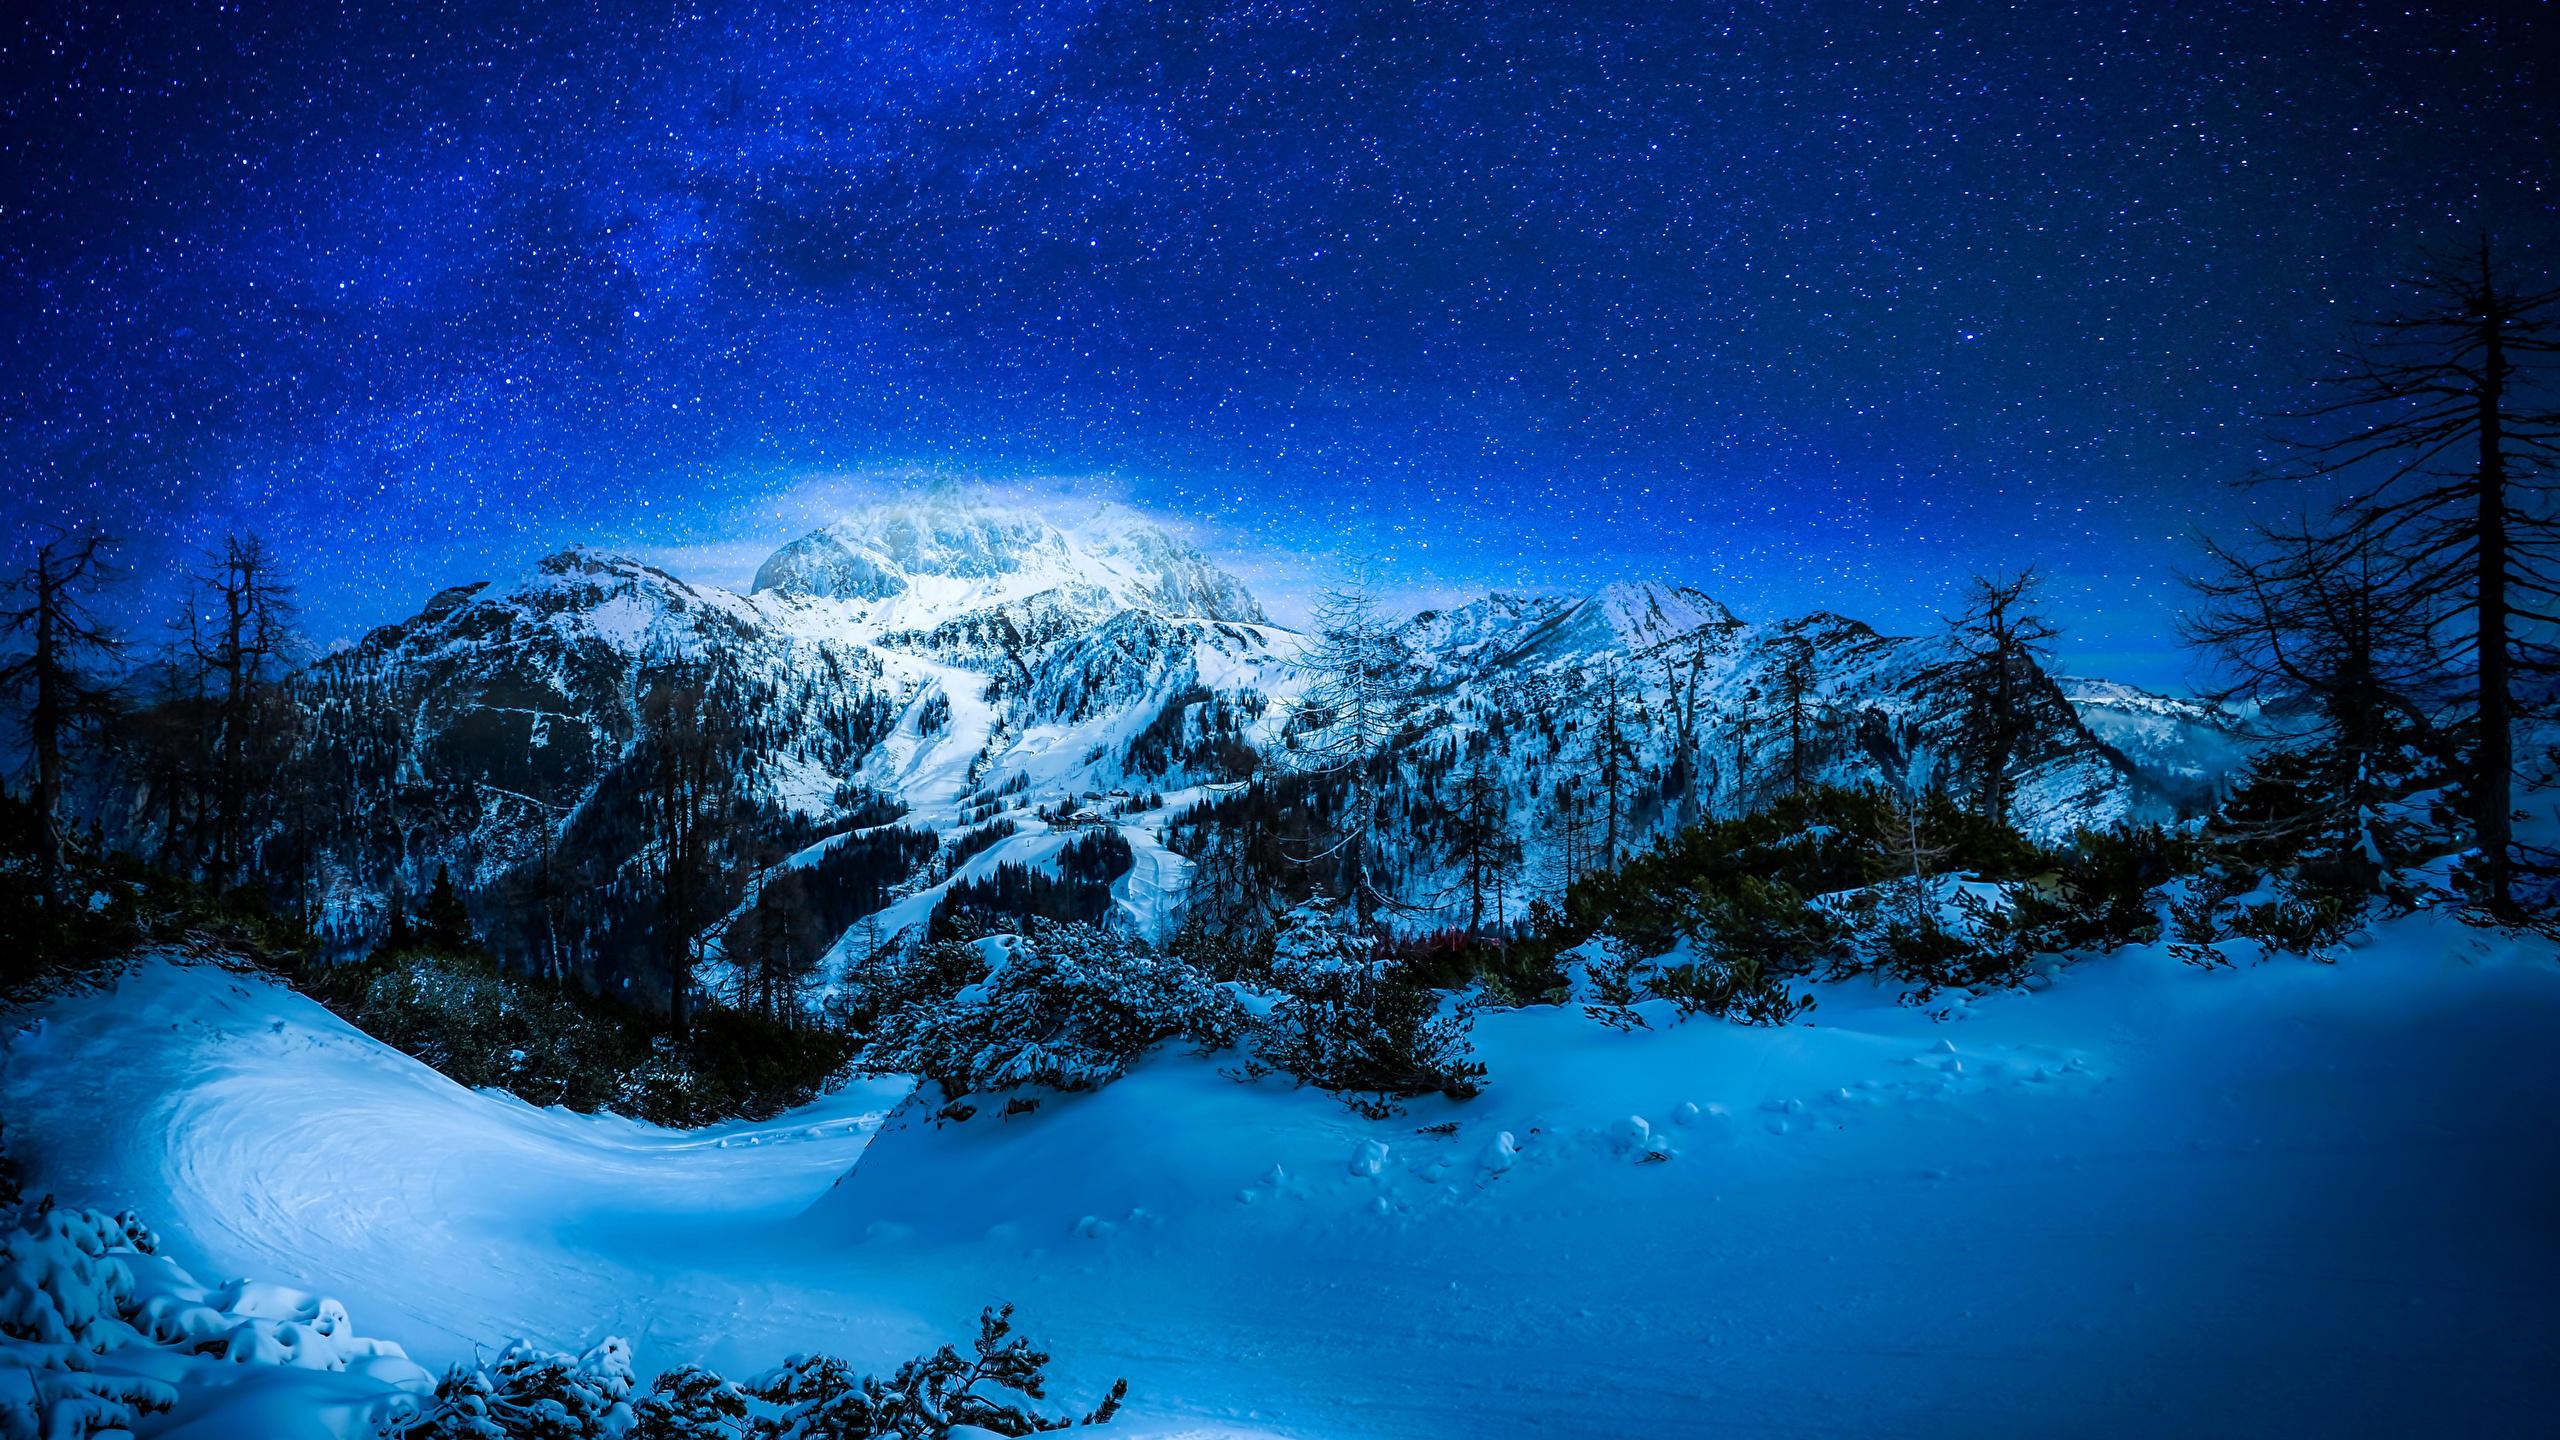 природа небо звезда снег зима деревья без смс